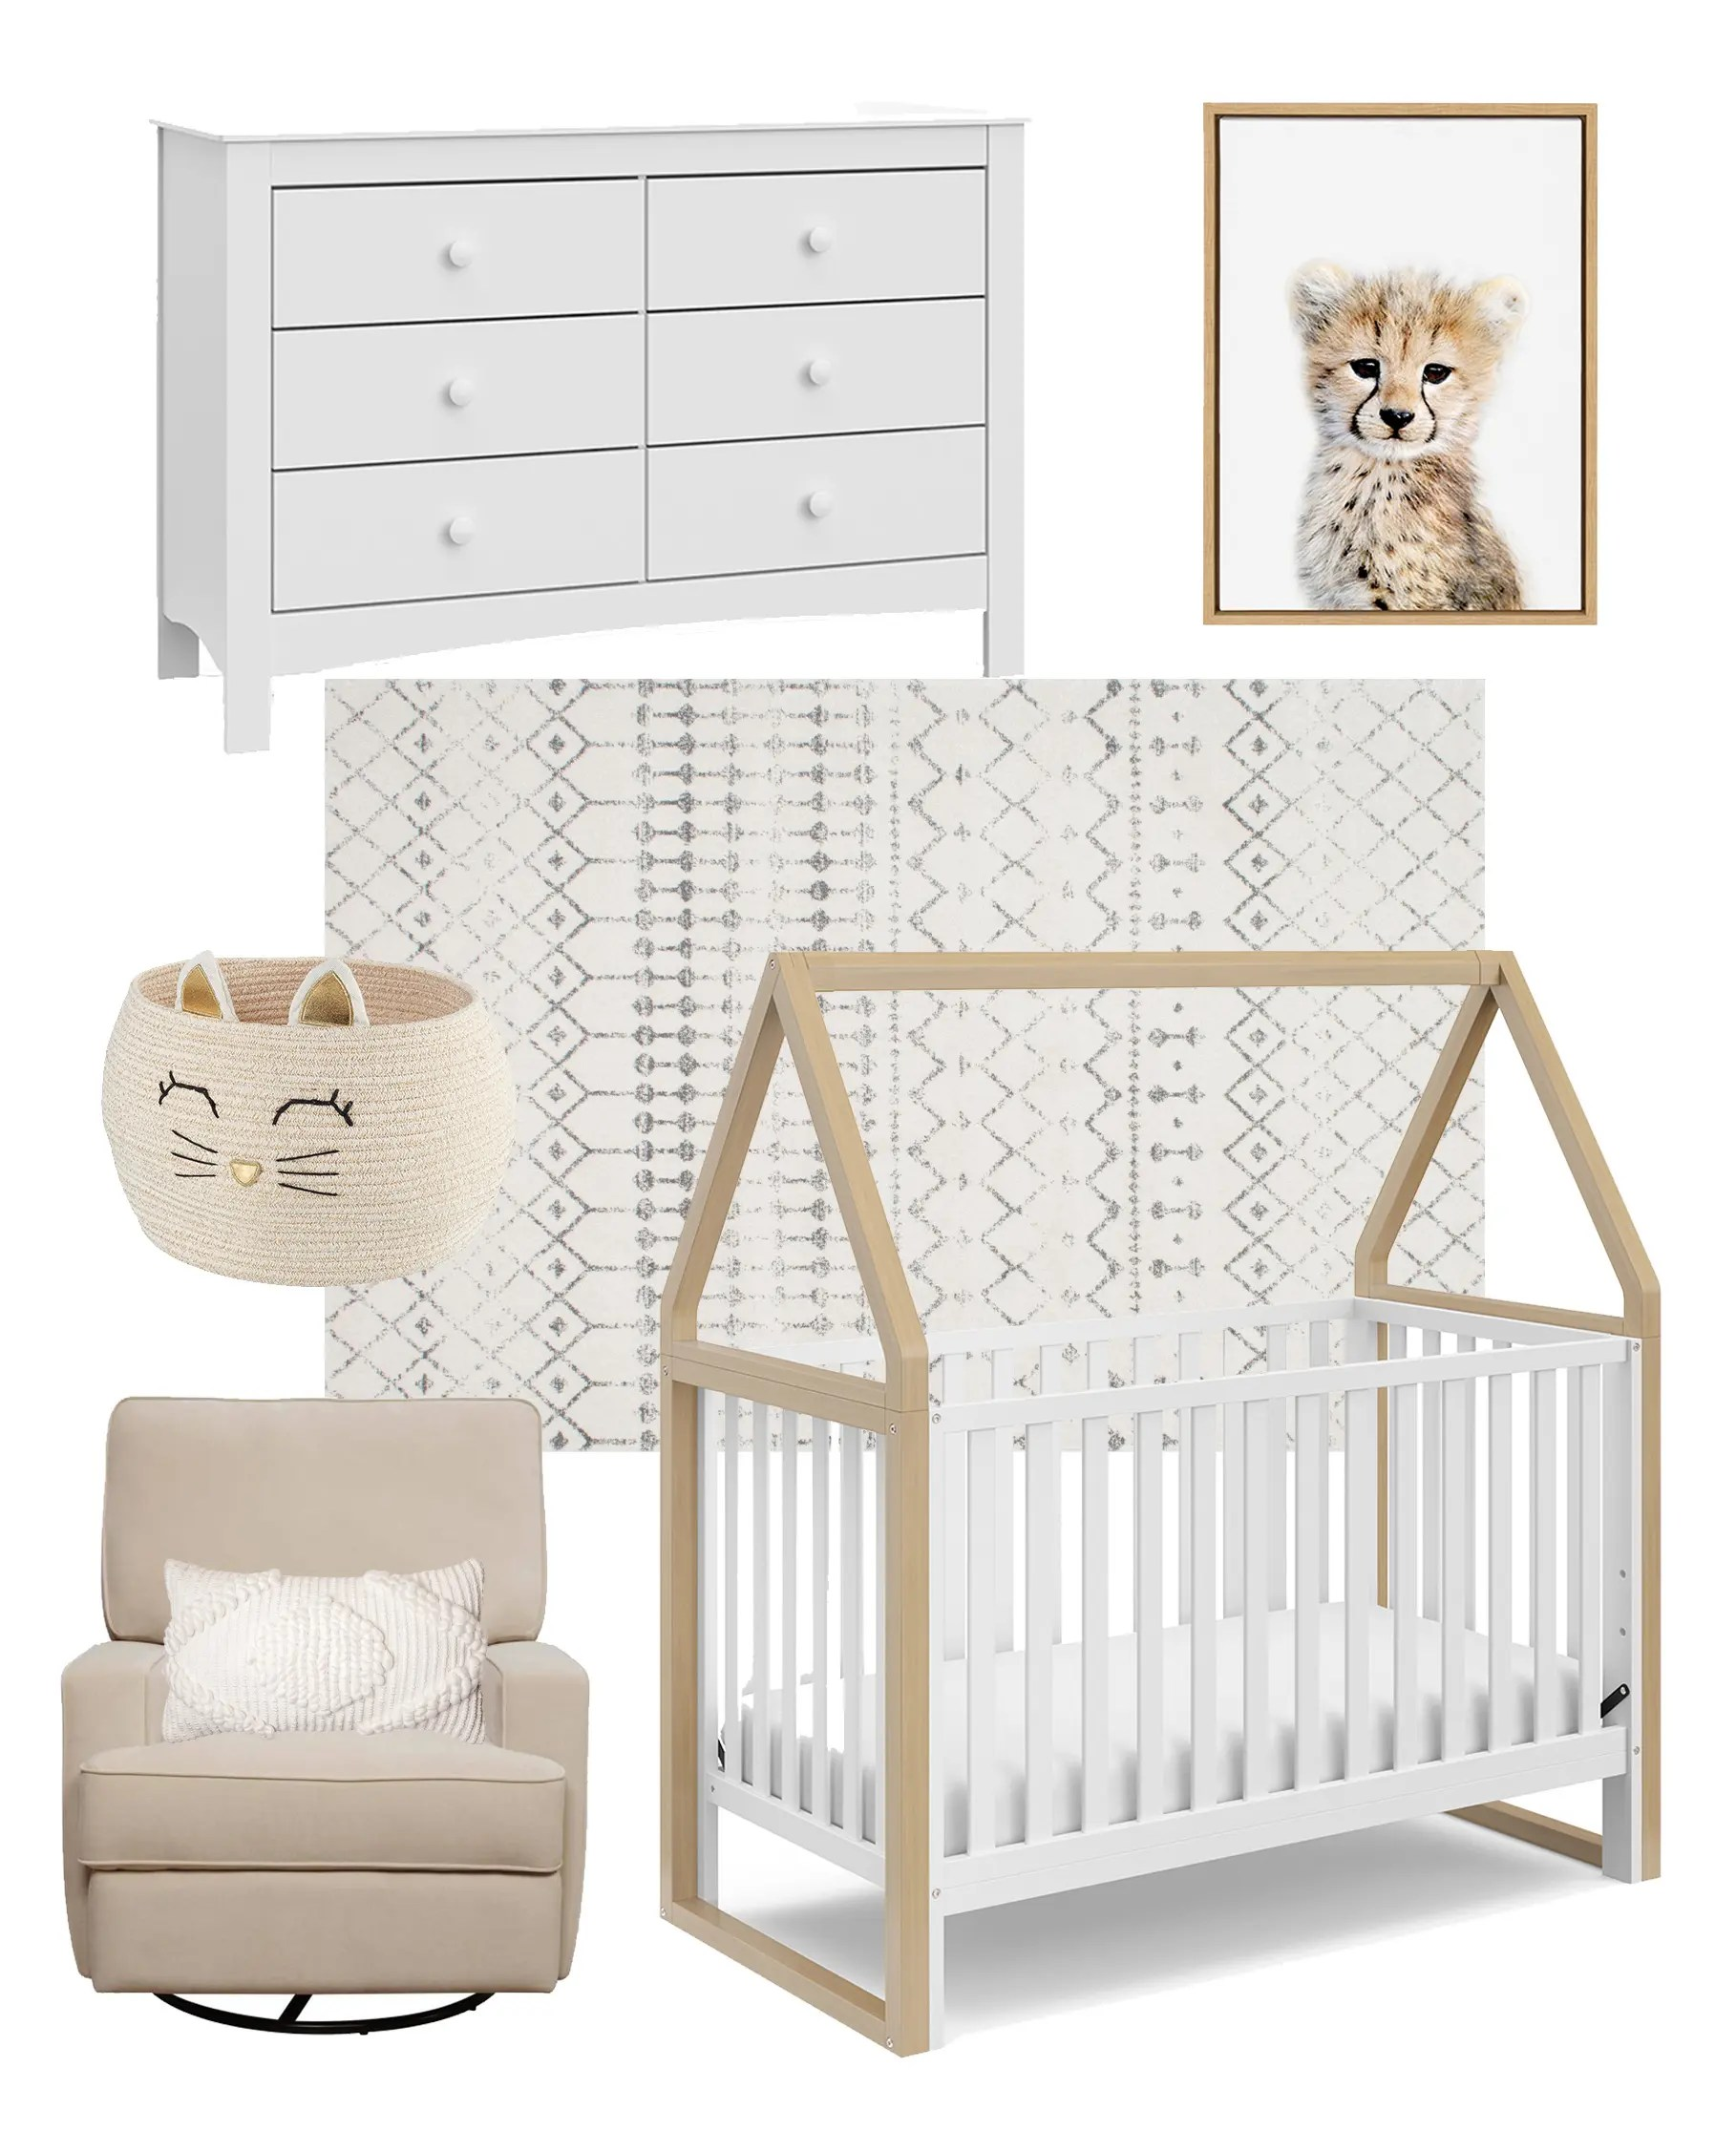 Affordable Neutral Nursery Ideas at walmart